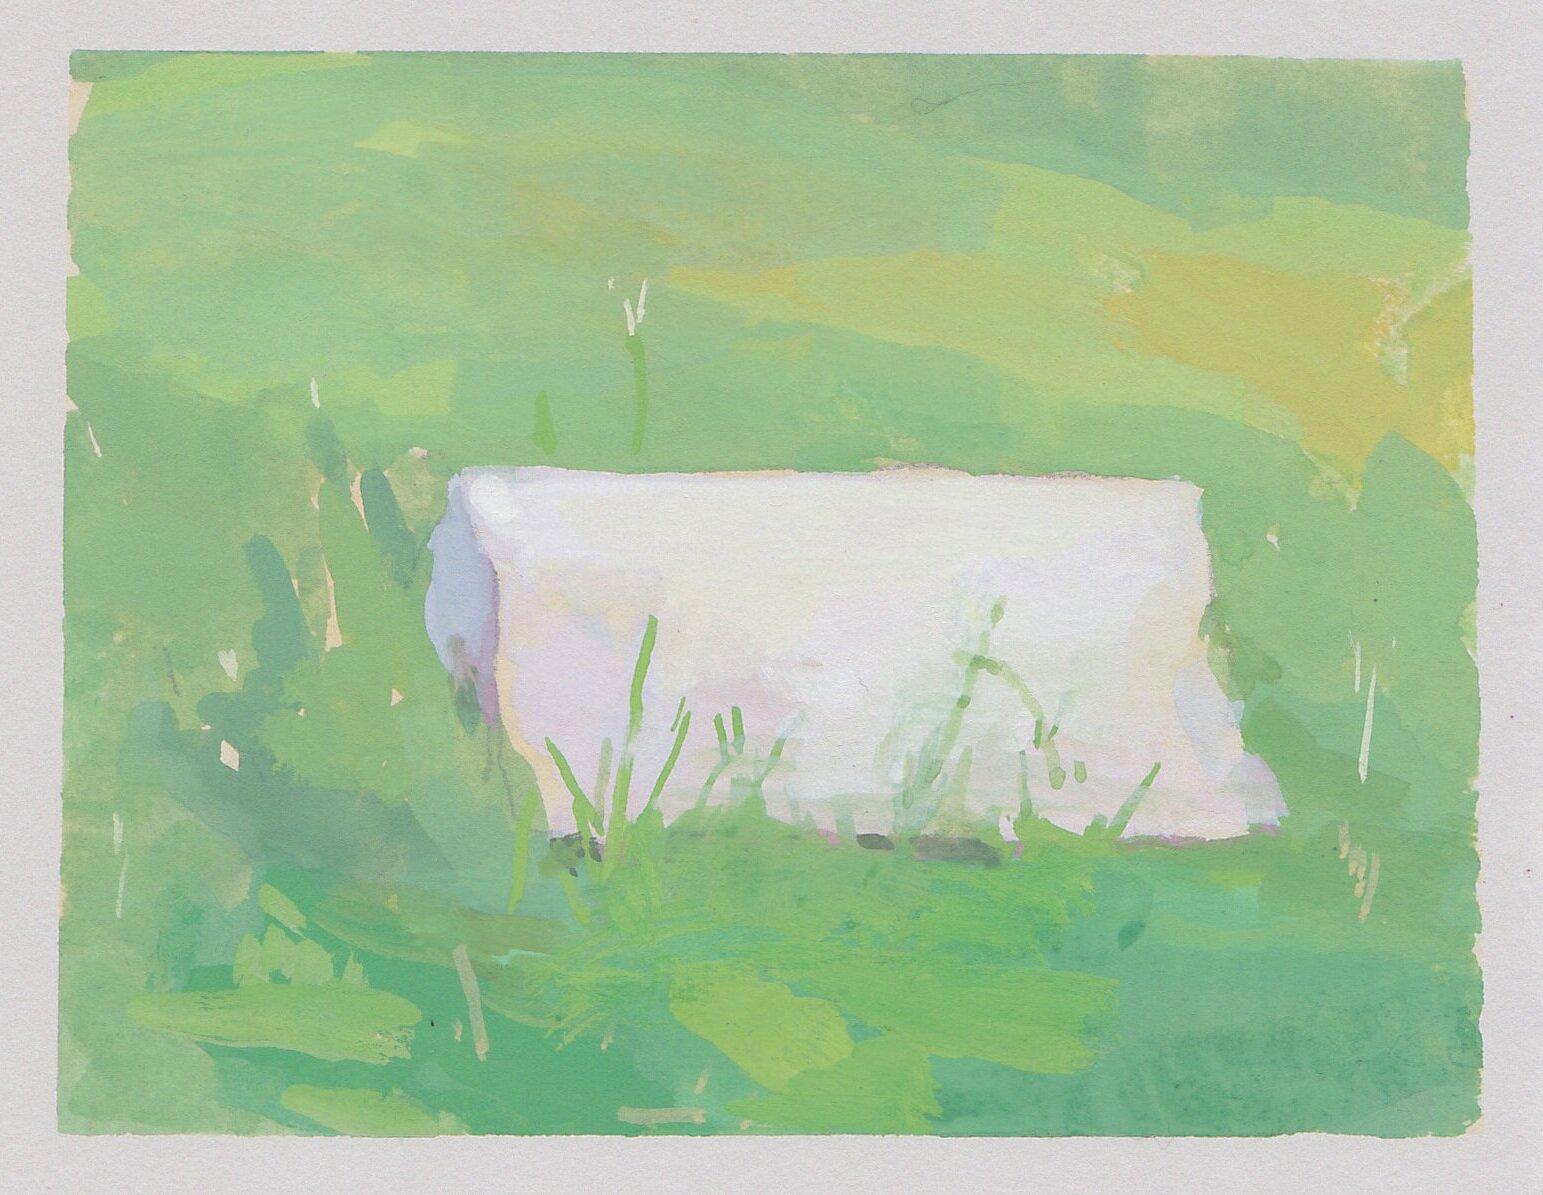 "untitled (brick)  gouache on paper 3.5 x 4.75"" 2019  private collection Newport Beach, CA"